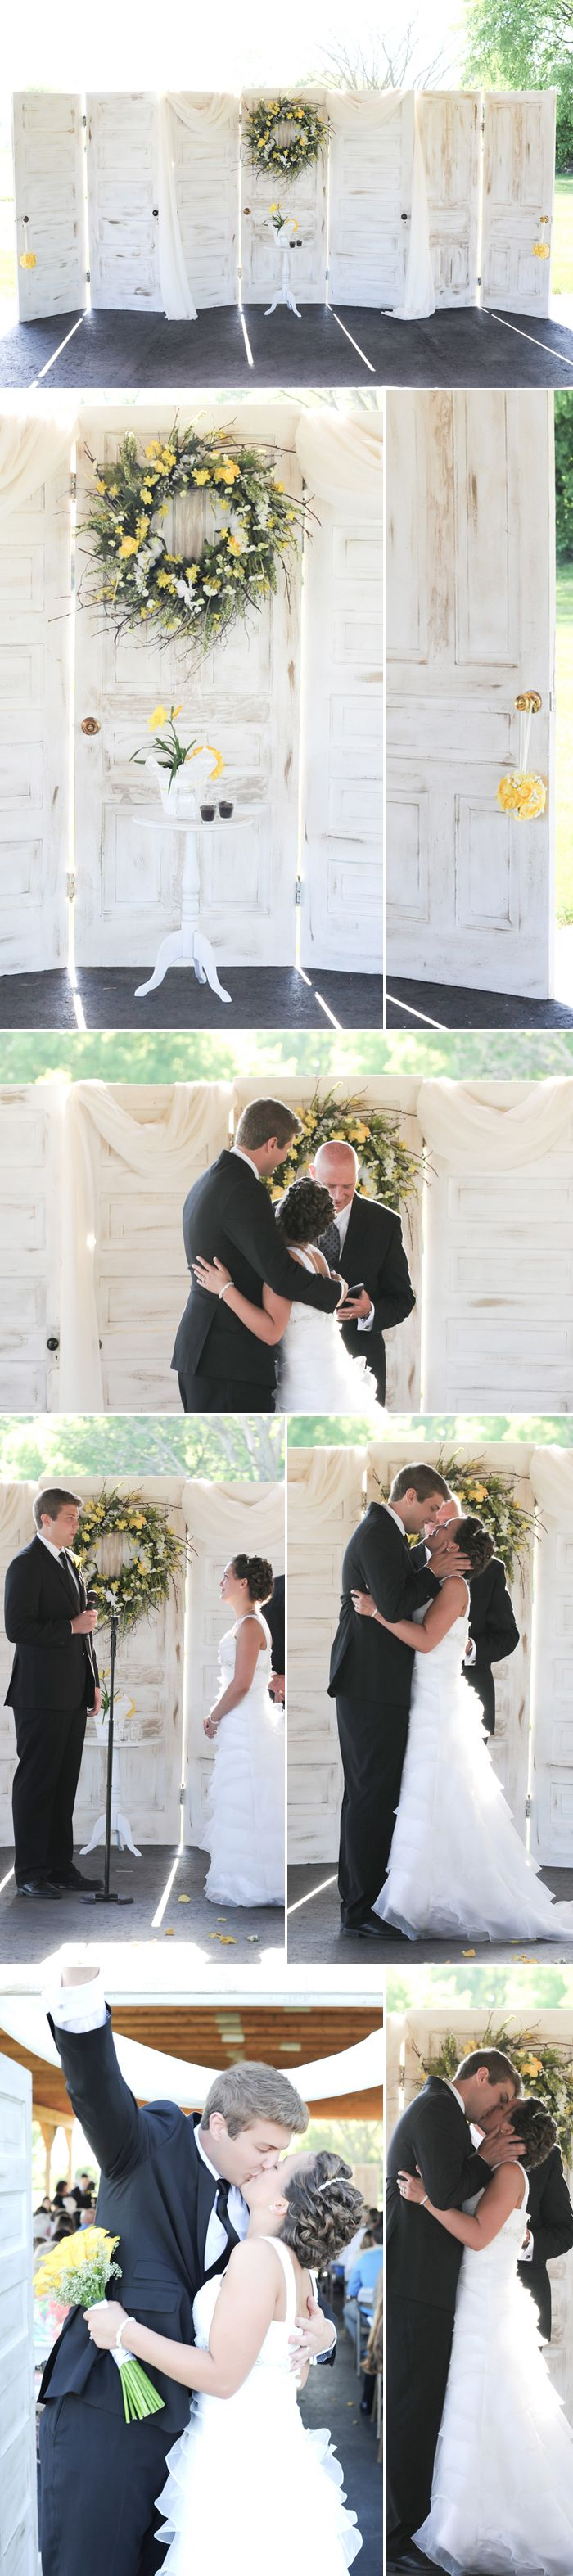 64 best Yellow Wedding images on Pinterest